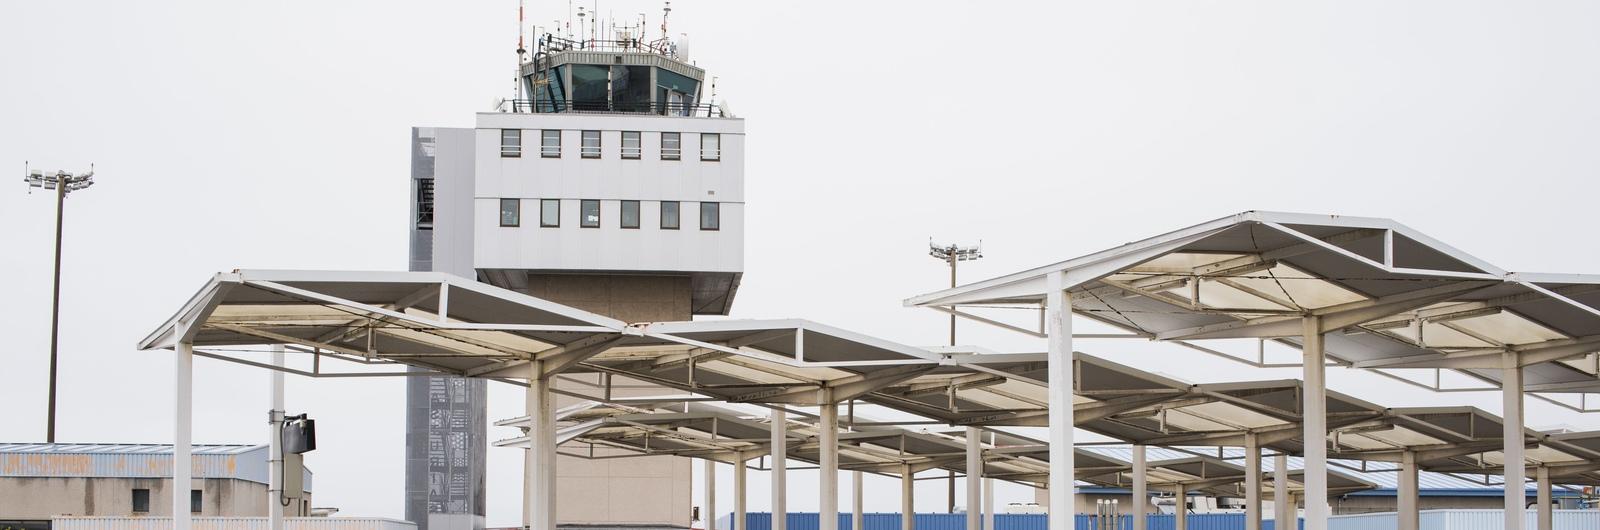 oviedo airport header